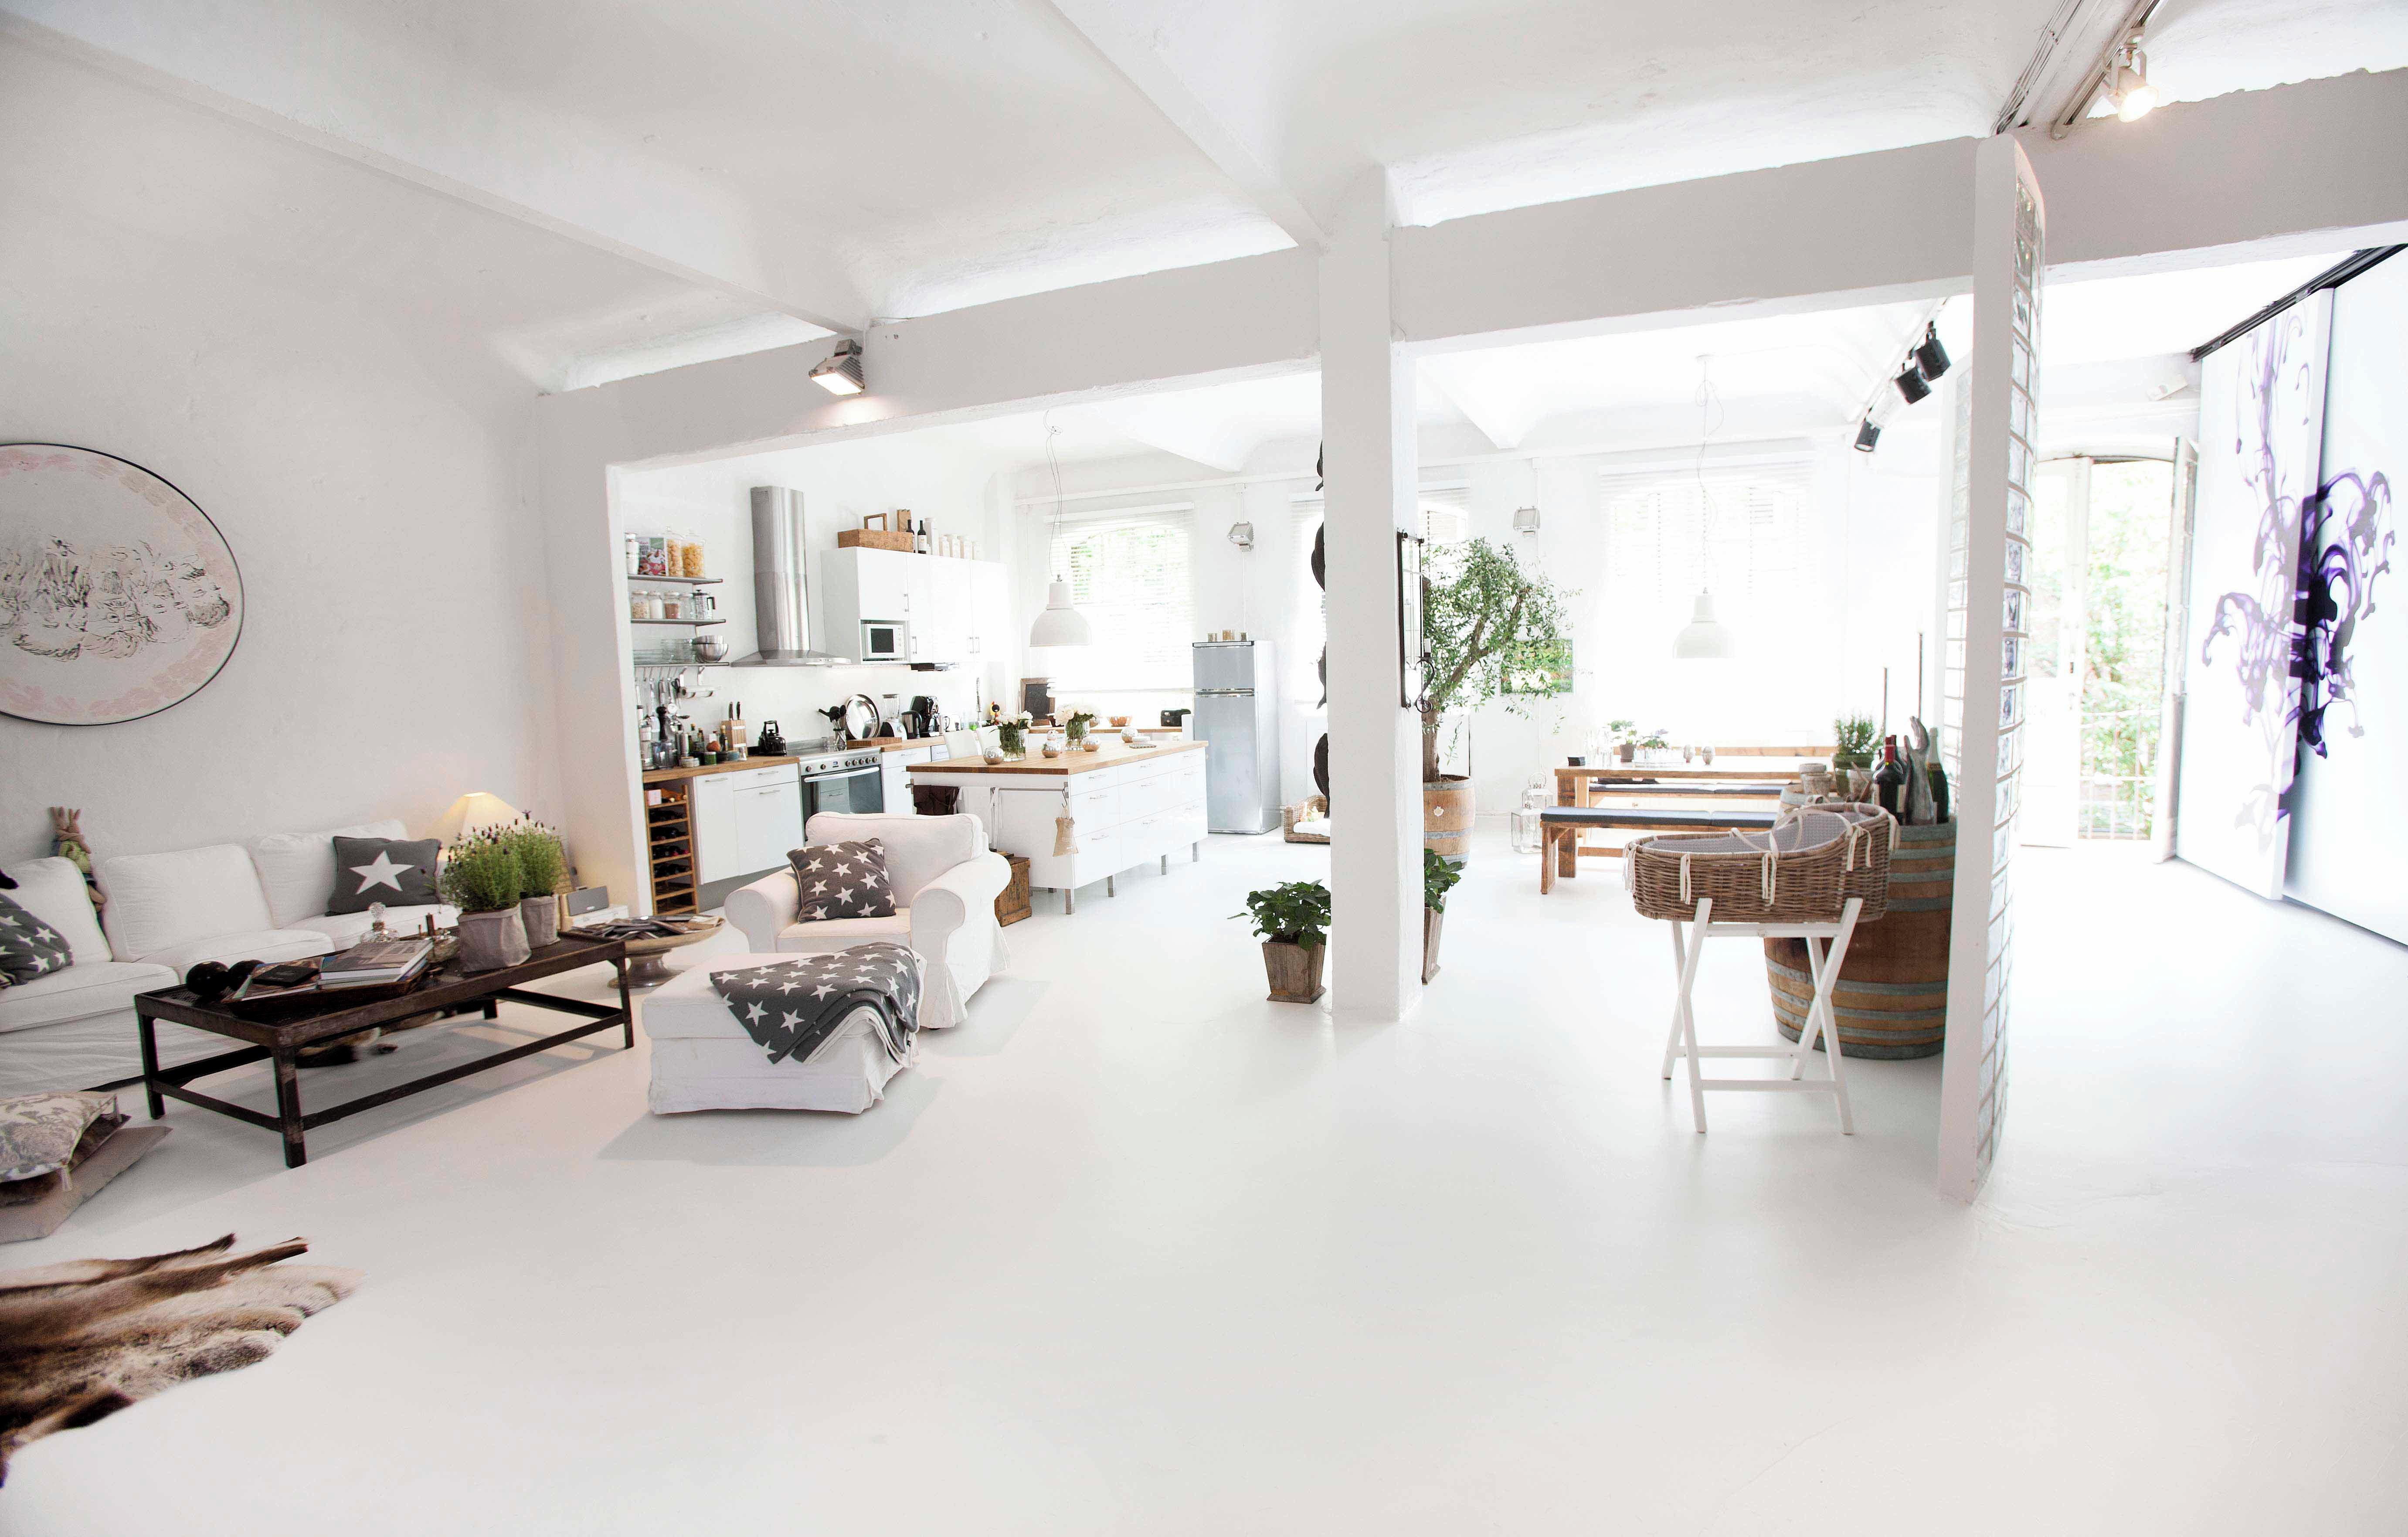 rent loft studio lassen hamburg spacebase. Black Bedroom Furniture Sets. Home Design Ideas